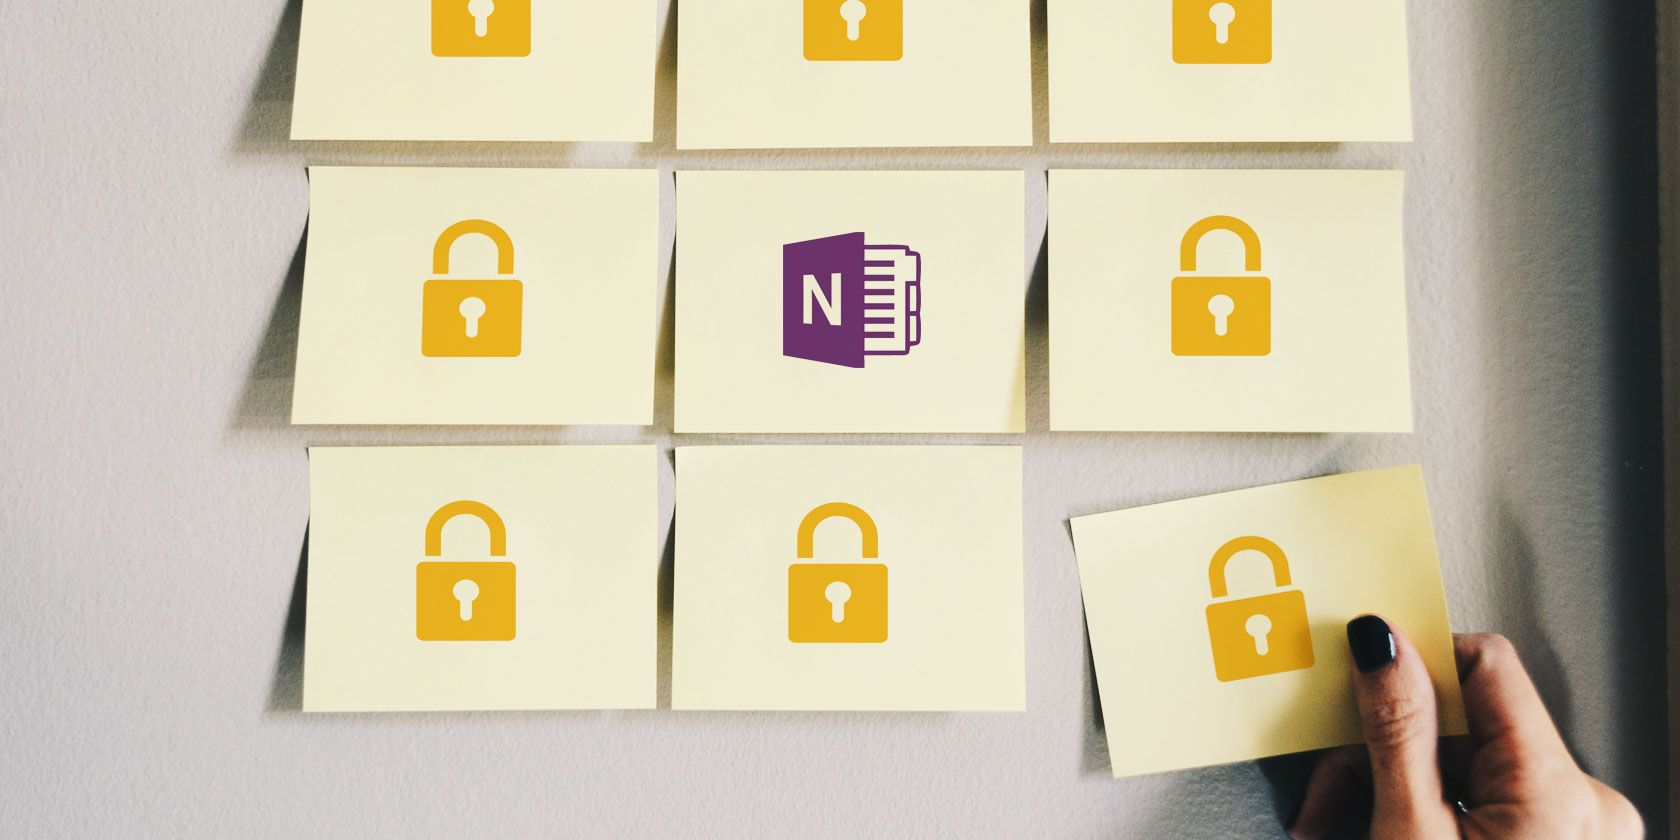 zaštititi lozinkom-OneNote